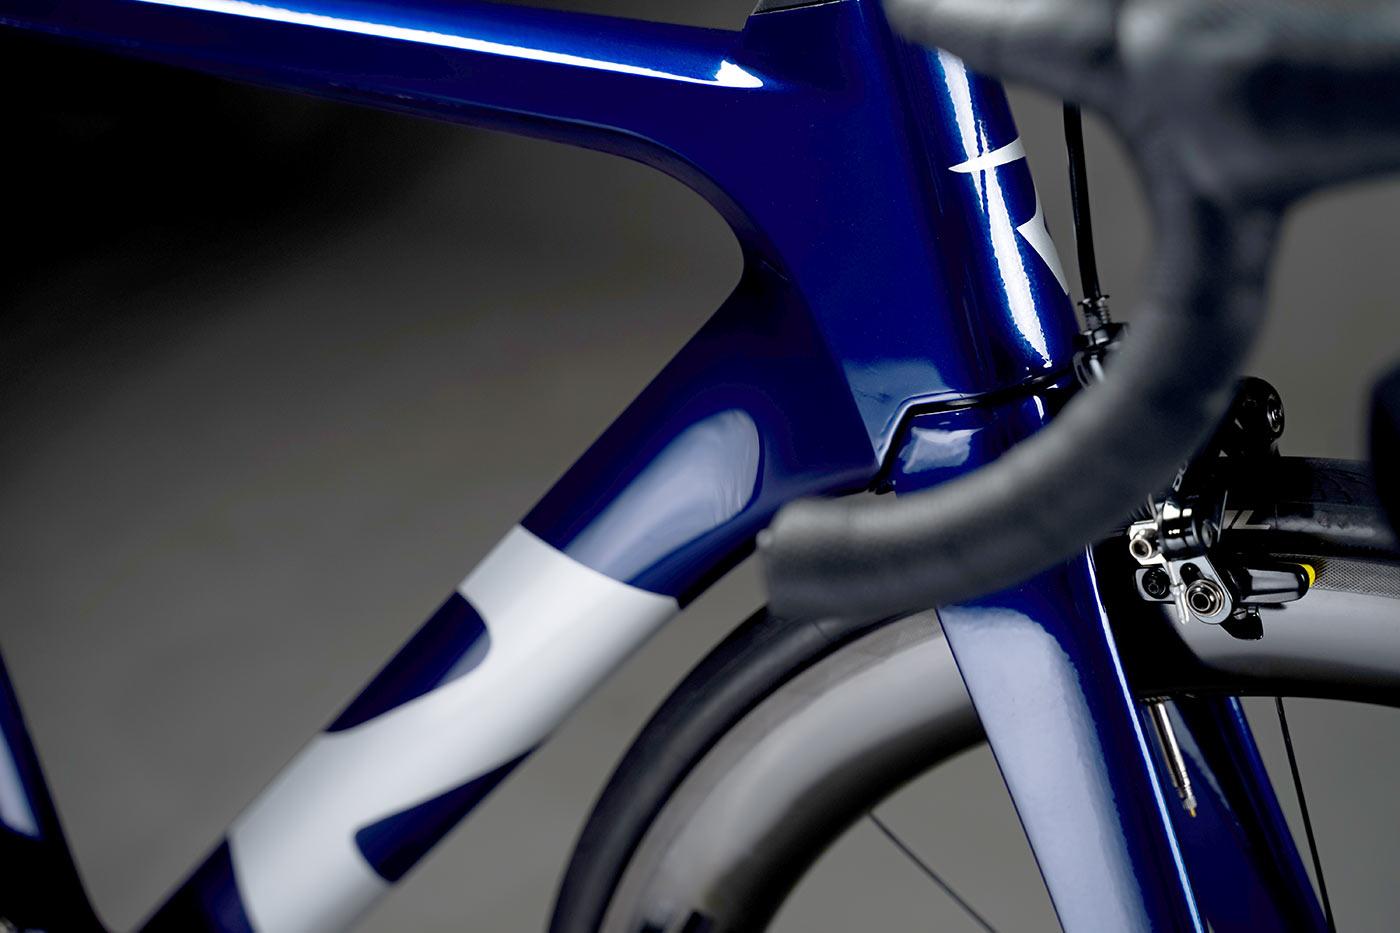 reap vekta aero road bike closeup frame details of head tube